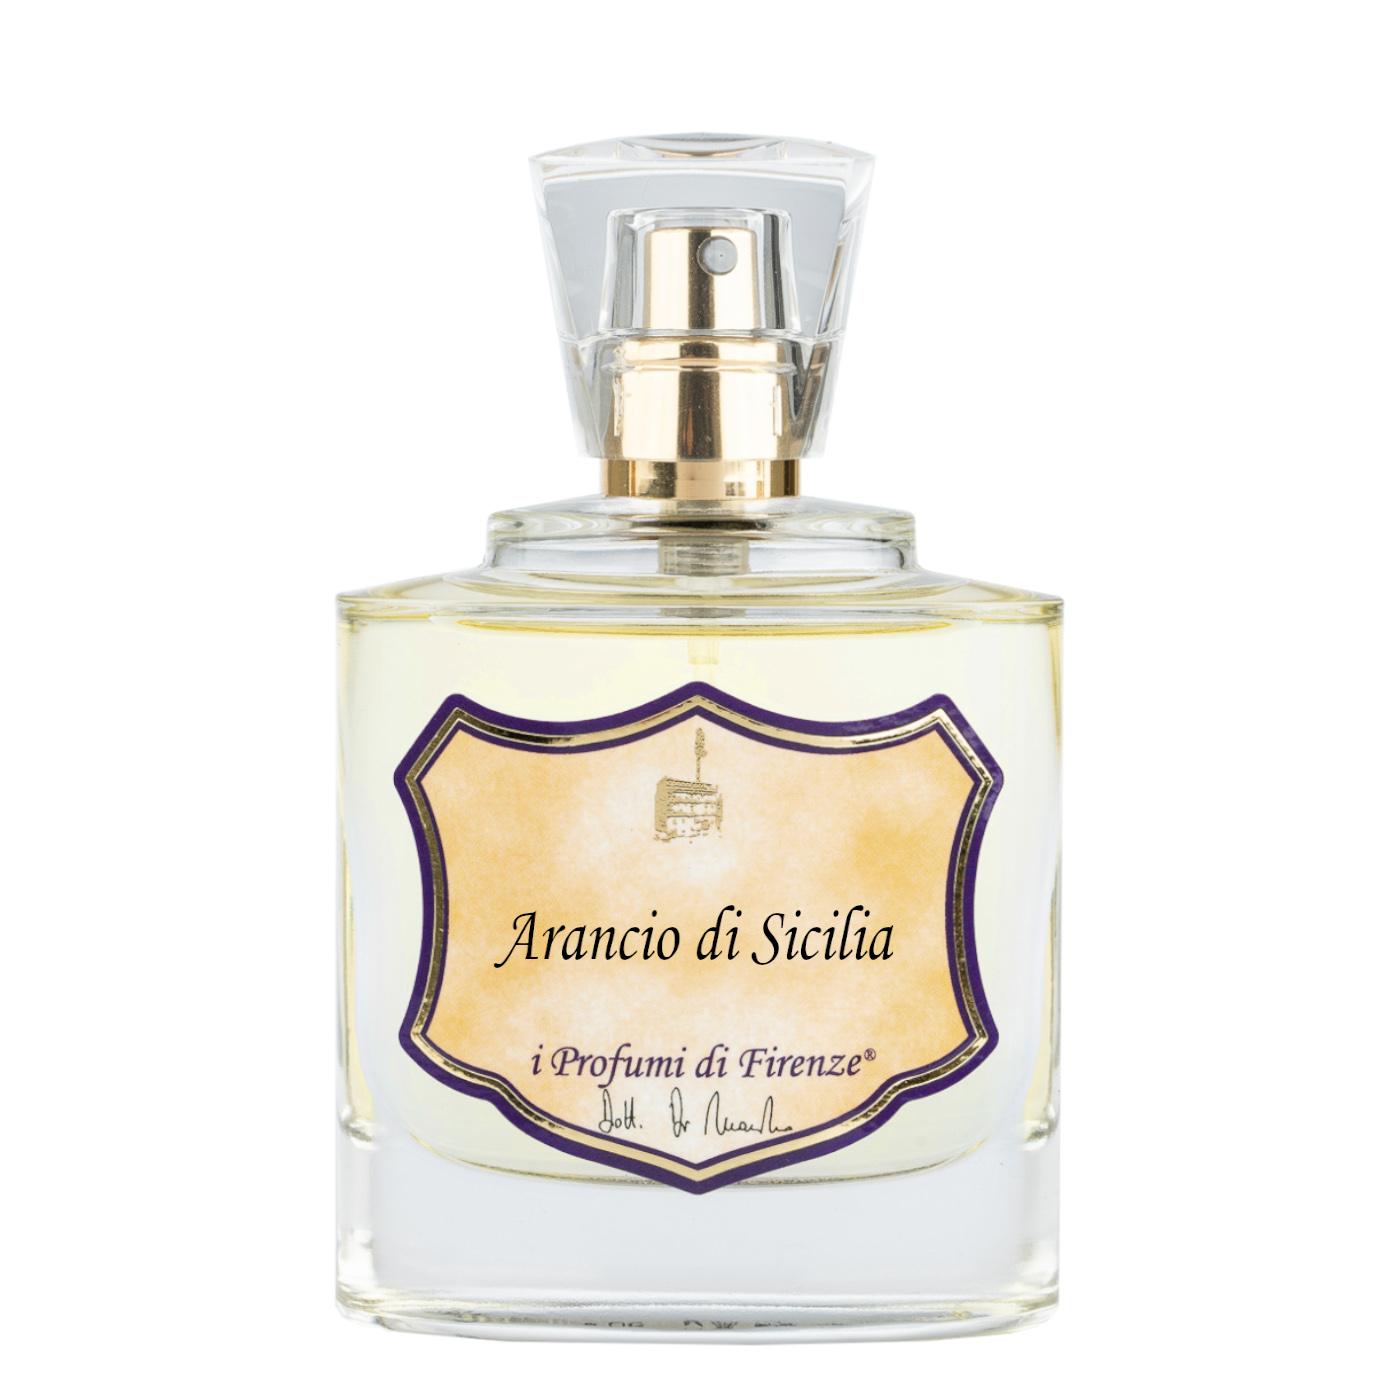 ARANCIO DI SICILIA - Eau de Parfum-0